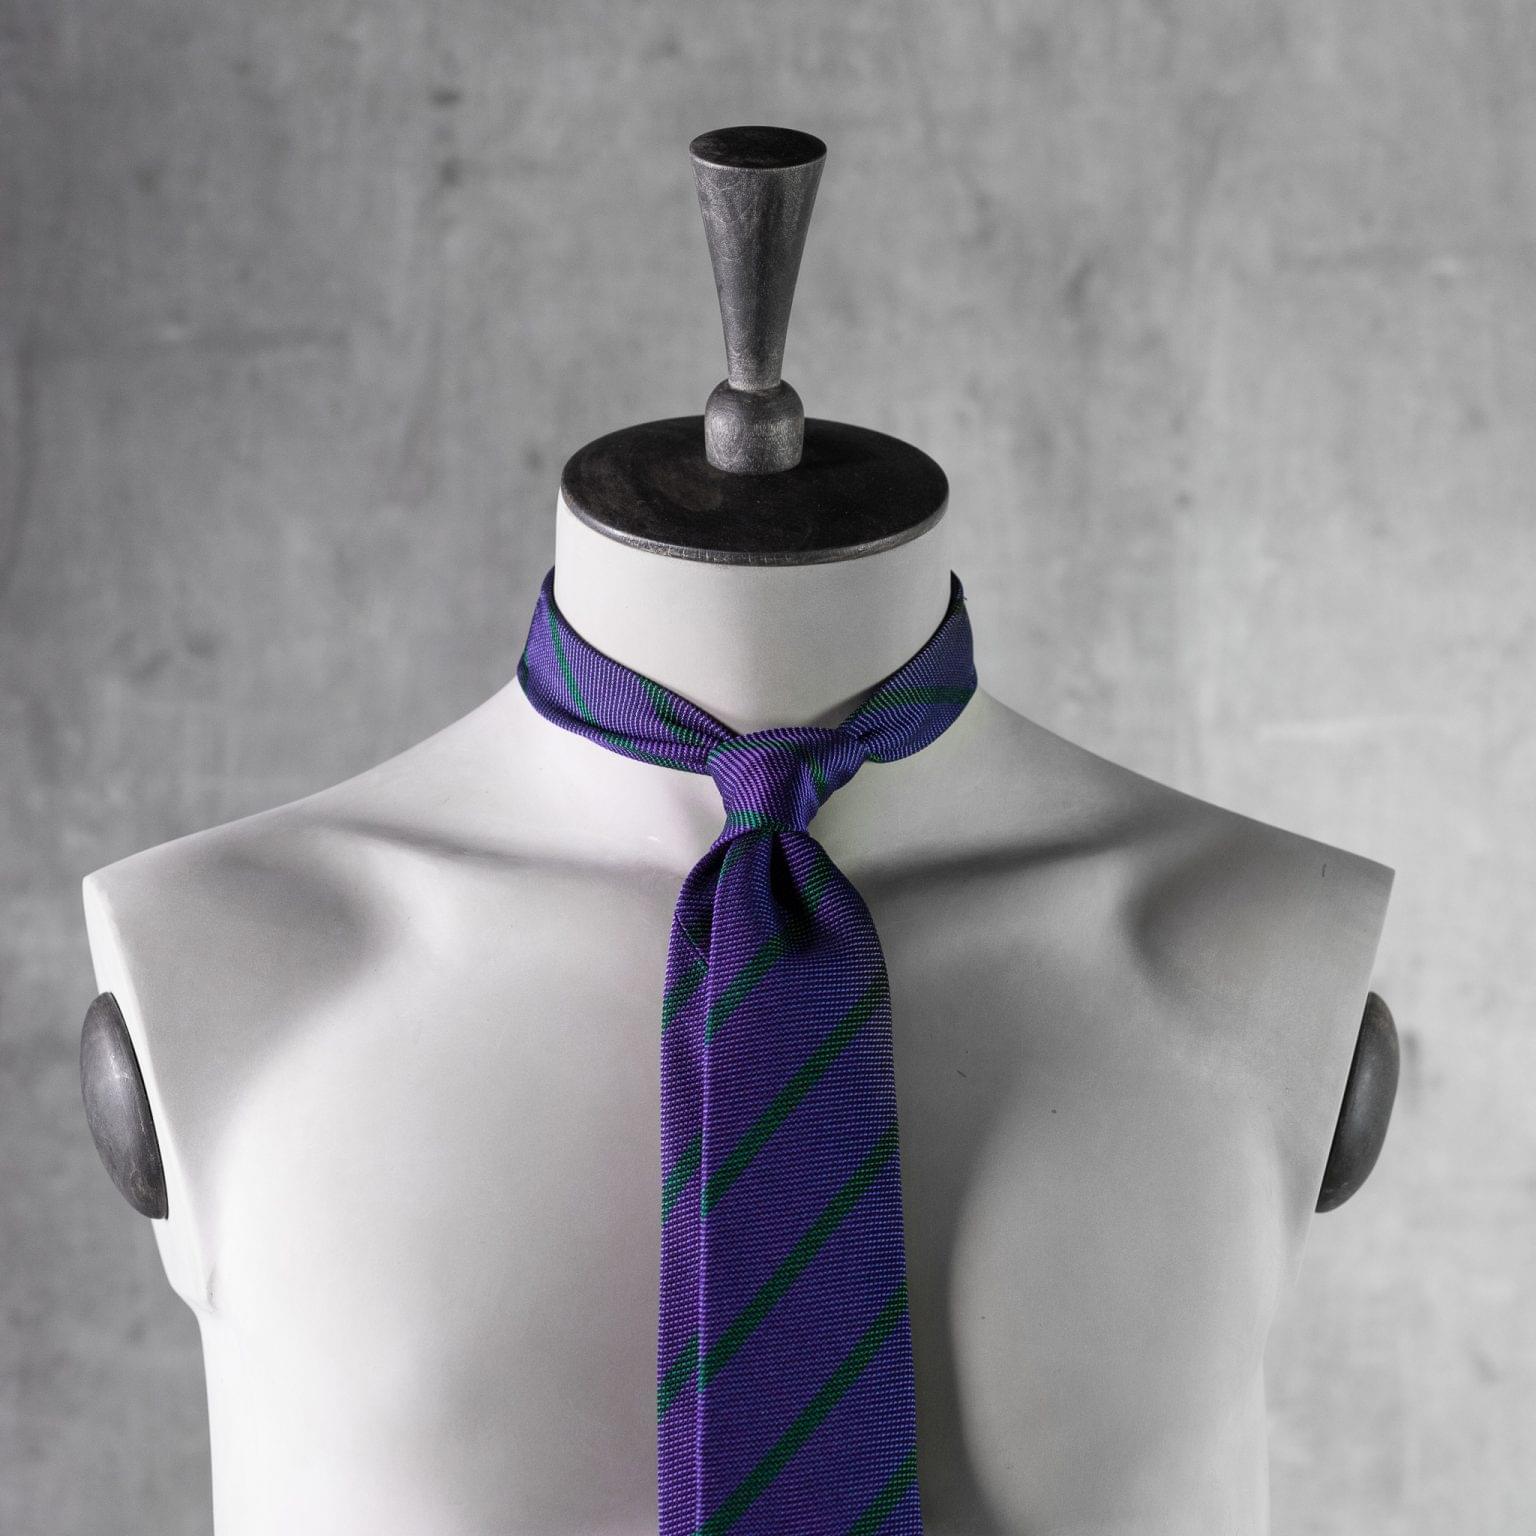 GRENADINE-0531-Tie-Initials-Corbata-Iniciales-The-Seelk-3